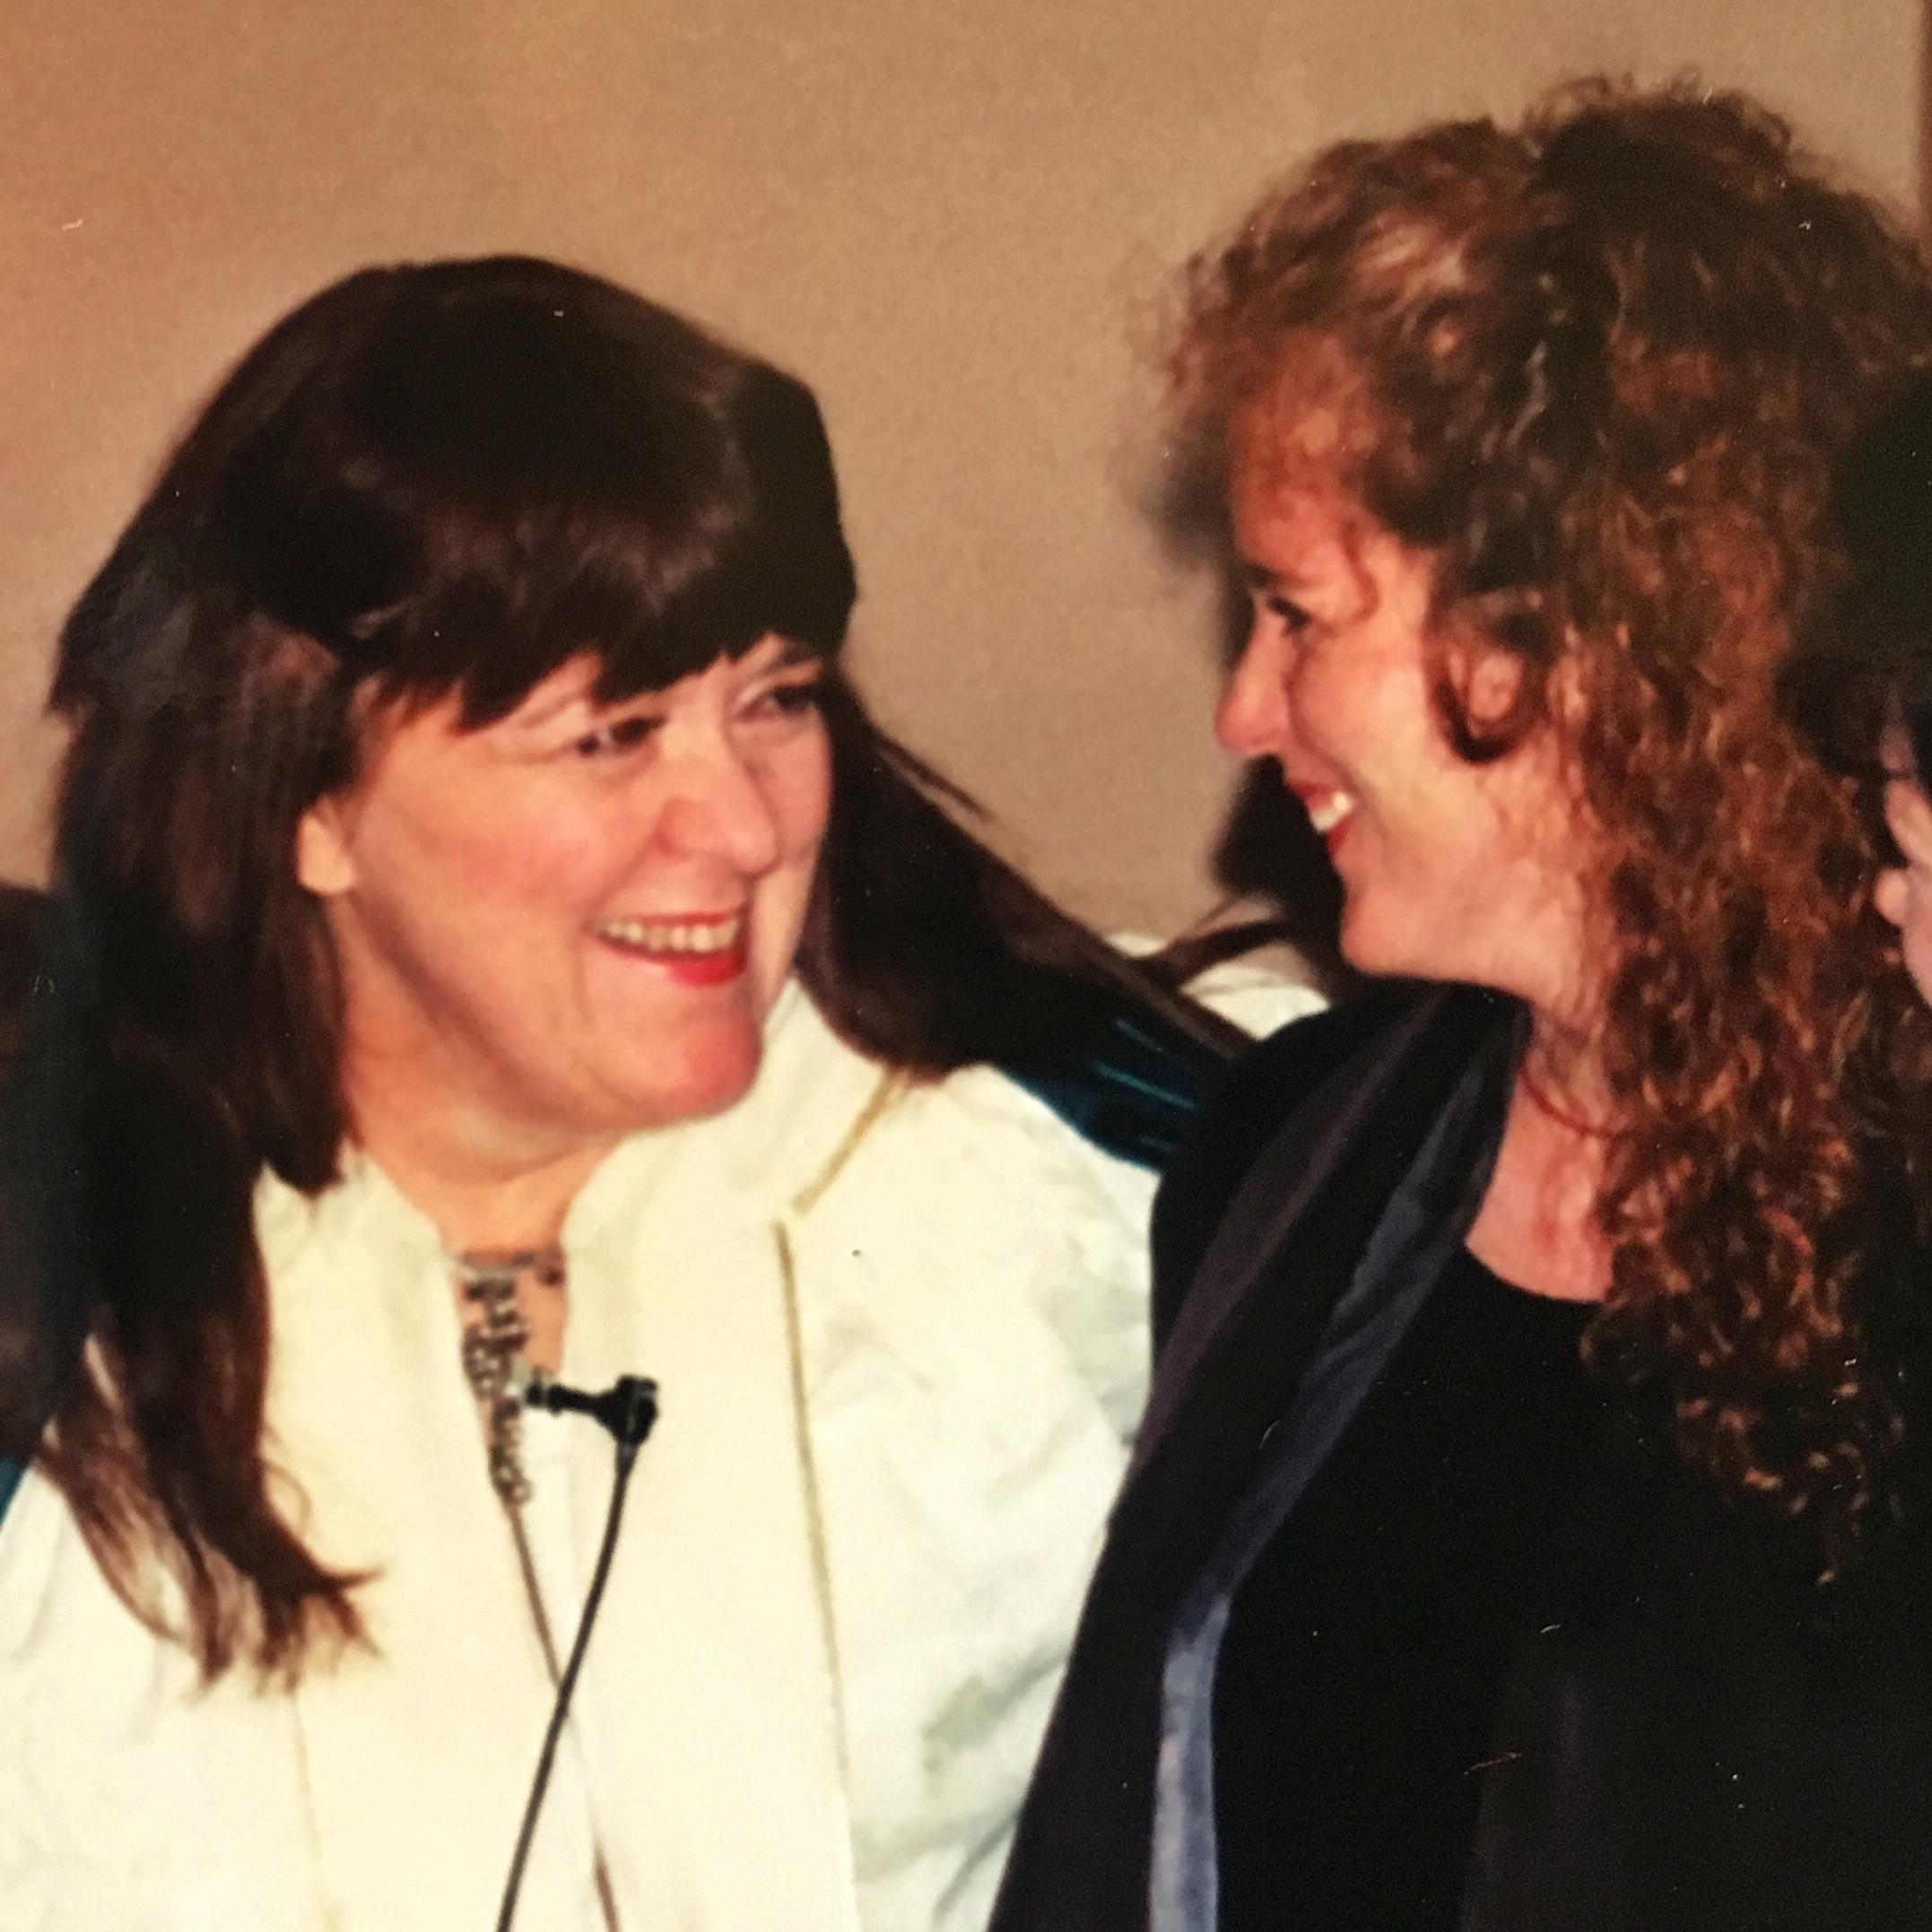 me-rosalyn-bruyere-1998.JPG